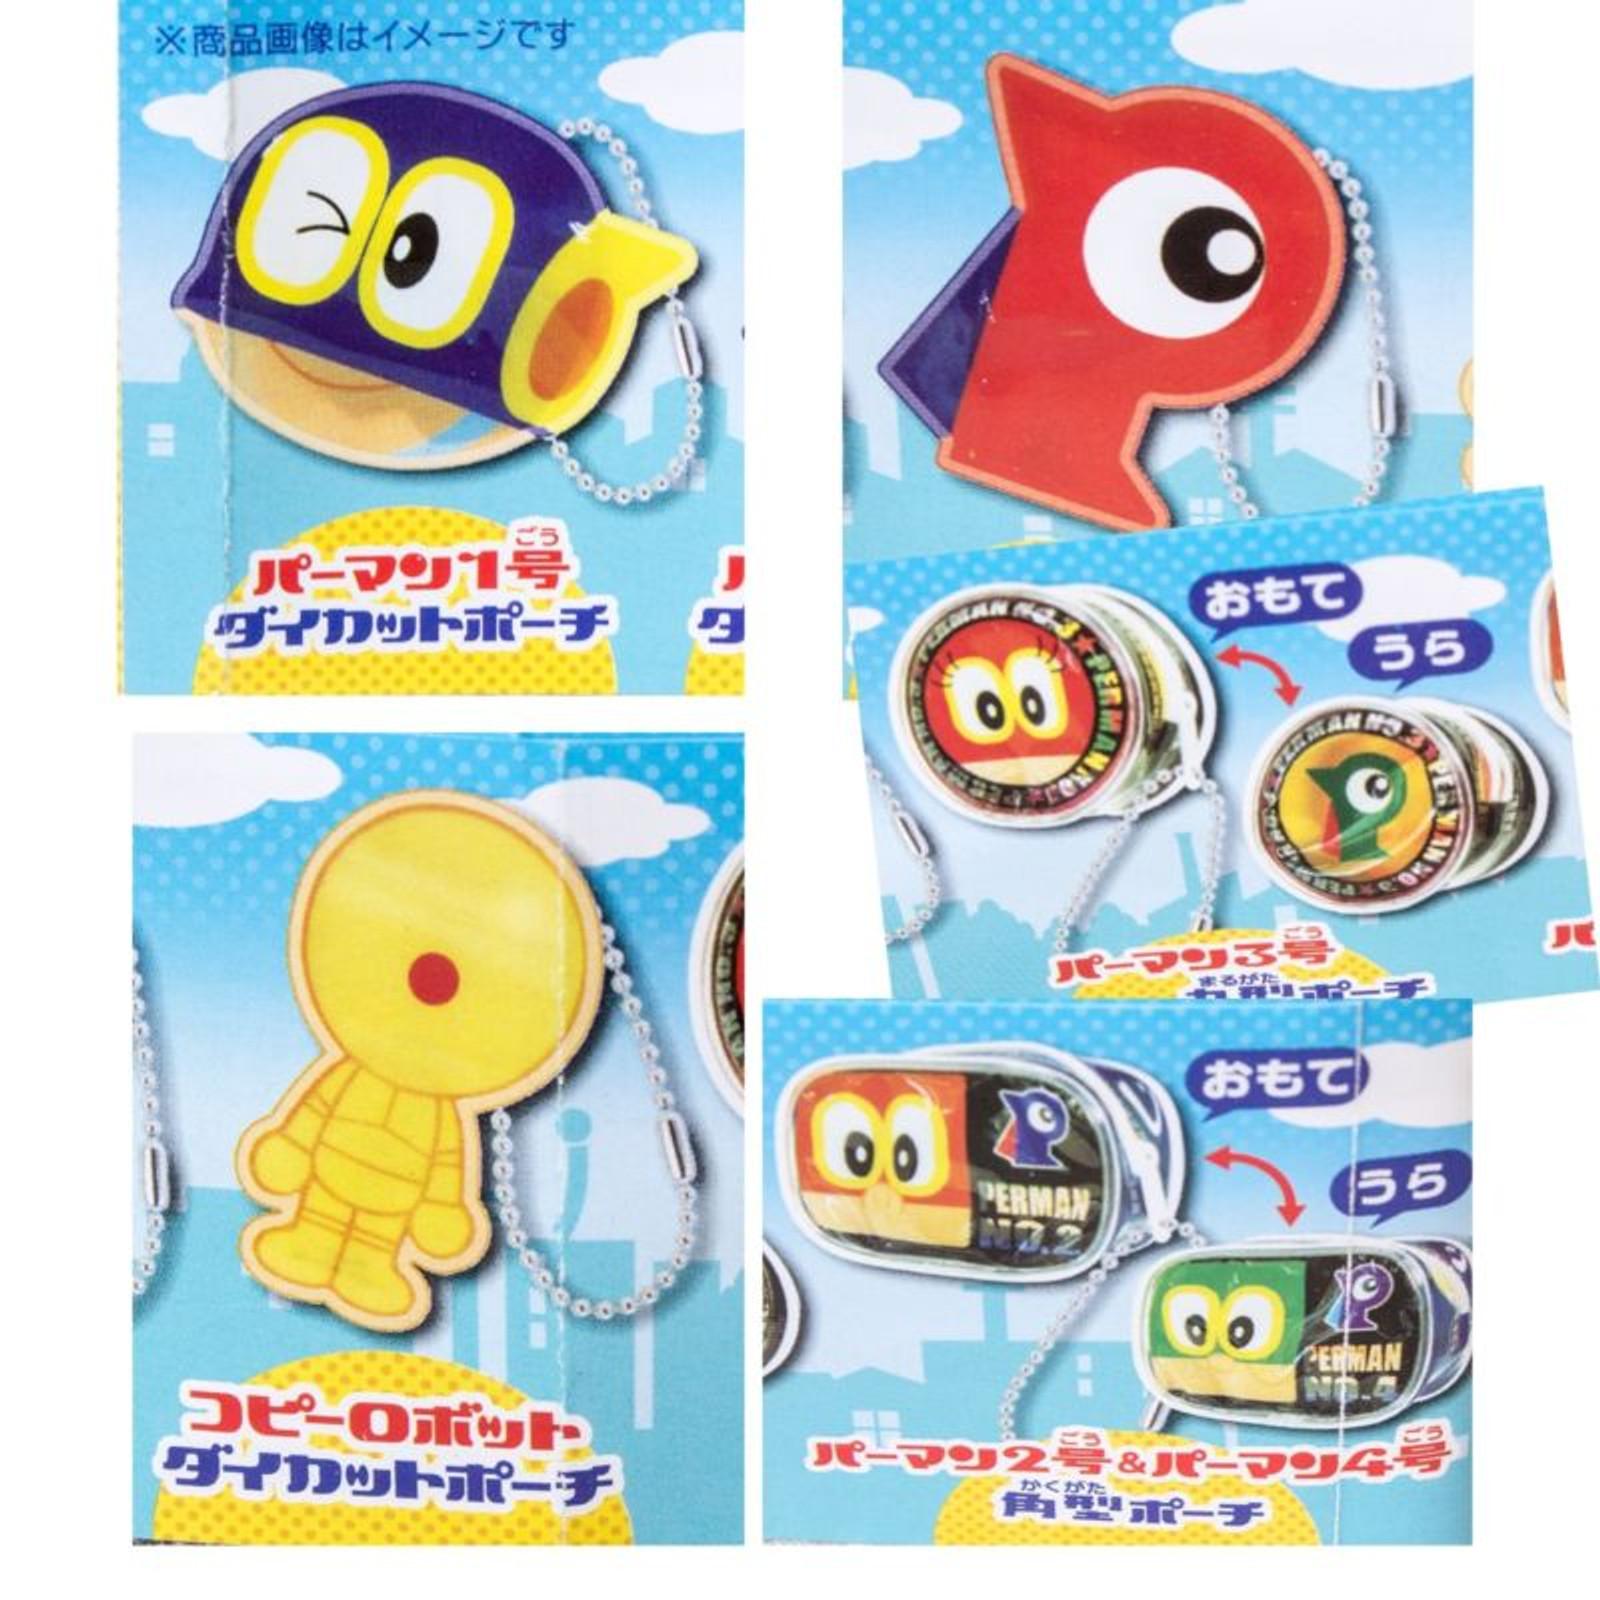 Set of 5 PAAMAN Mini Pouch Bag Complete Set TAKARA TOMY JAPAN ANIME FUJIKO FUJIO